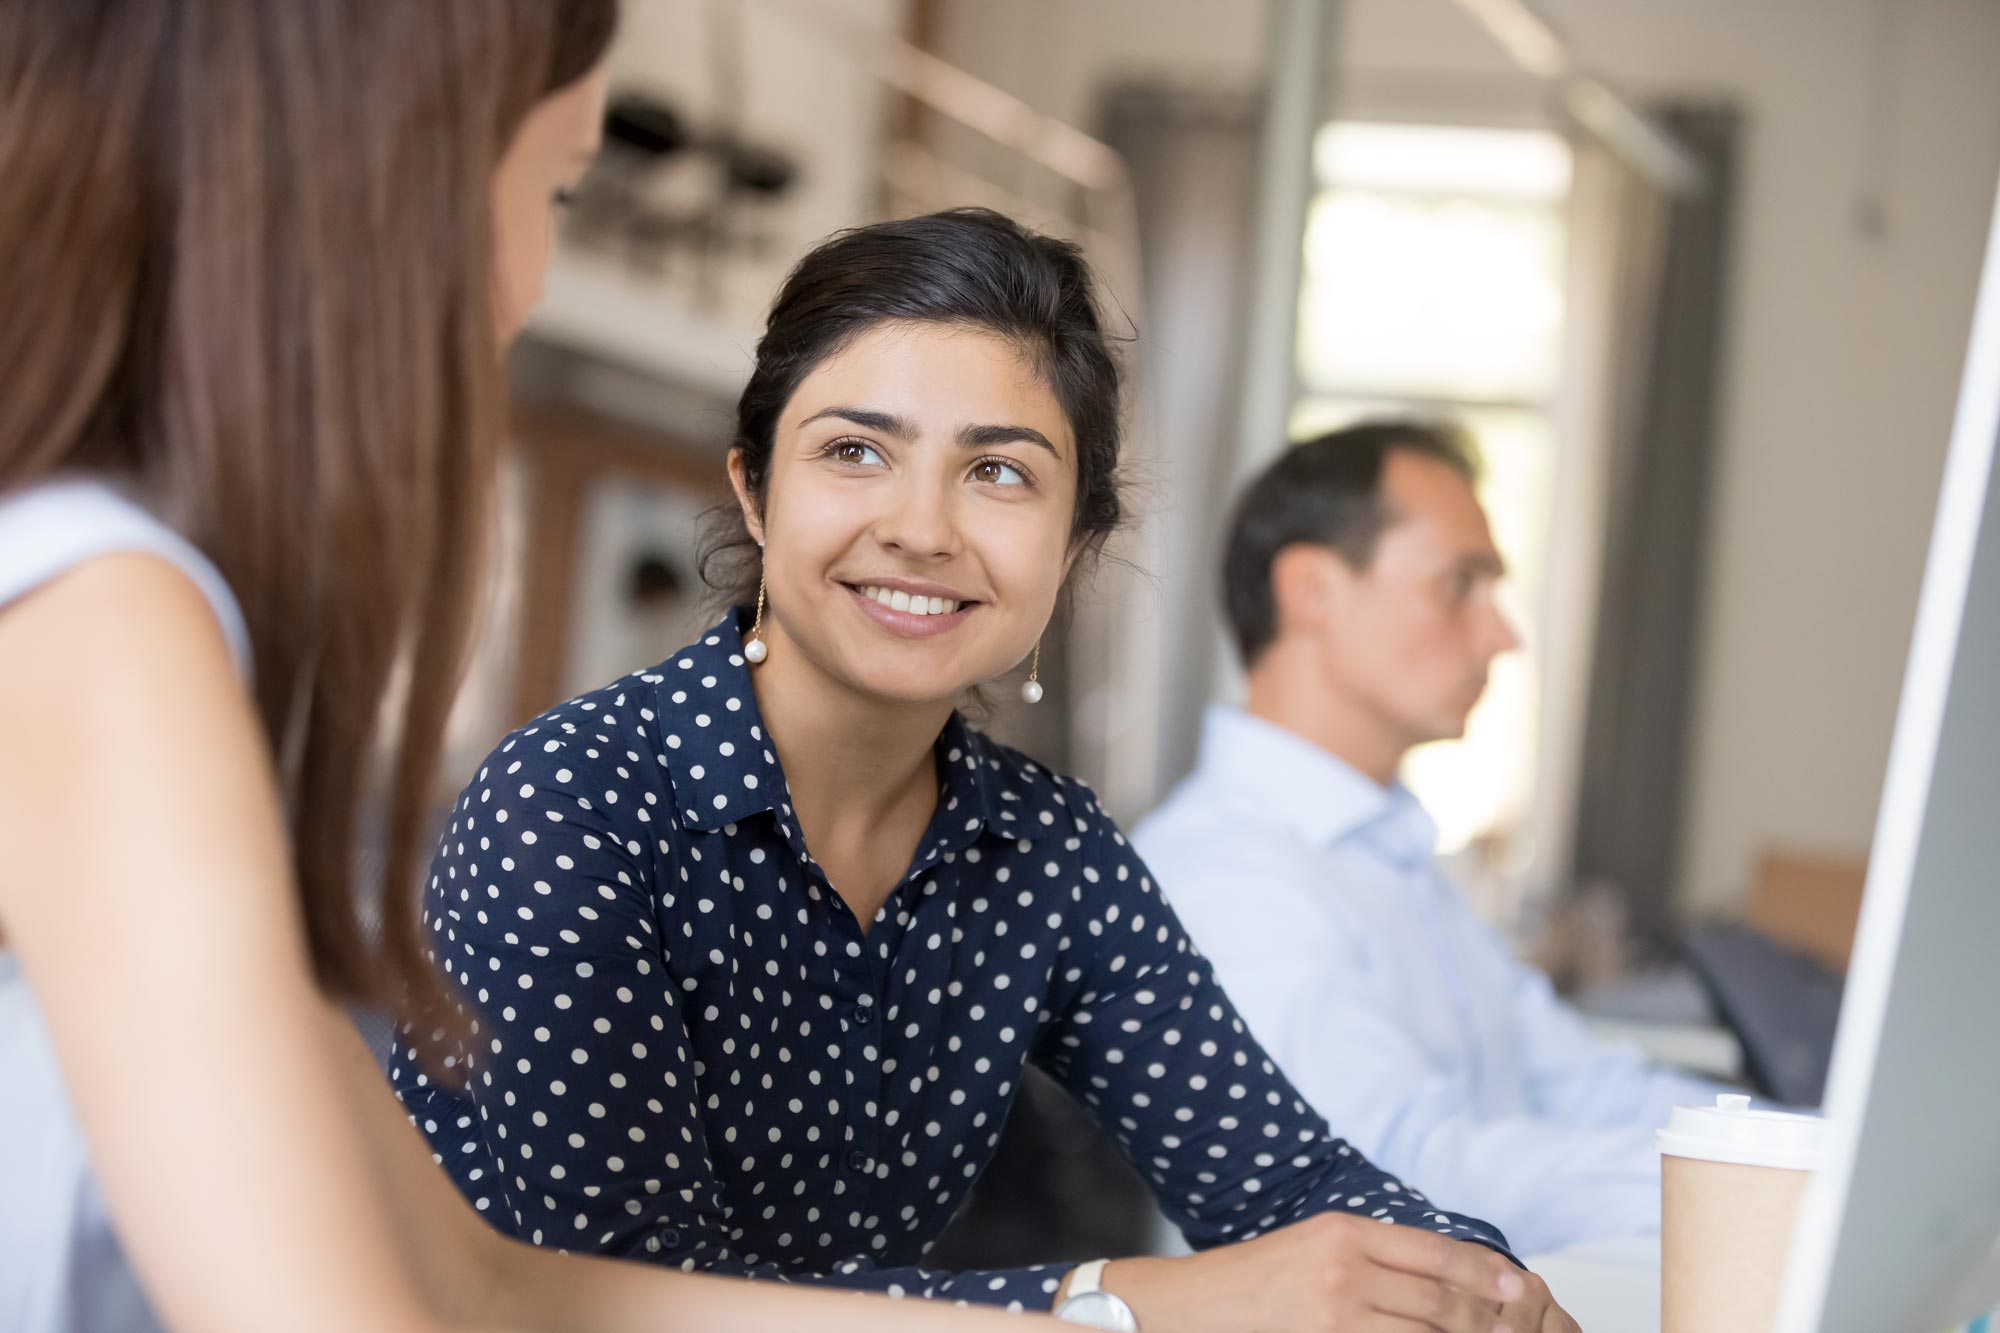 5 Ways to Prepare for your Marketing Internship